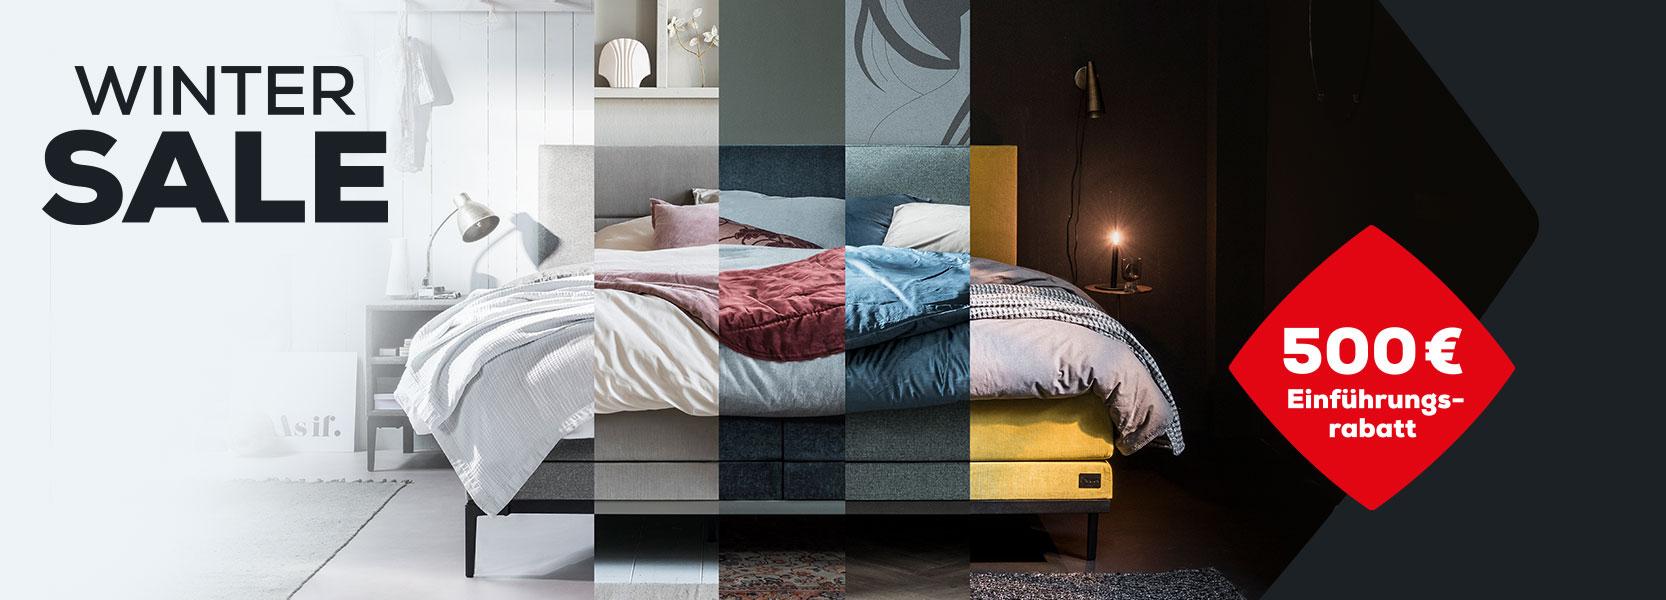 Lifestyle designed for you Kollektion| Swiss Sense